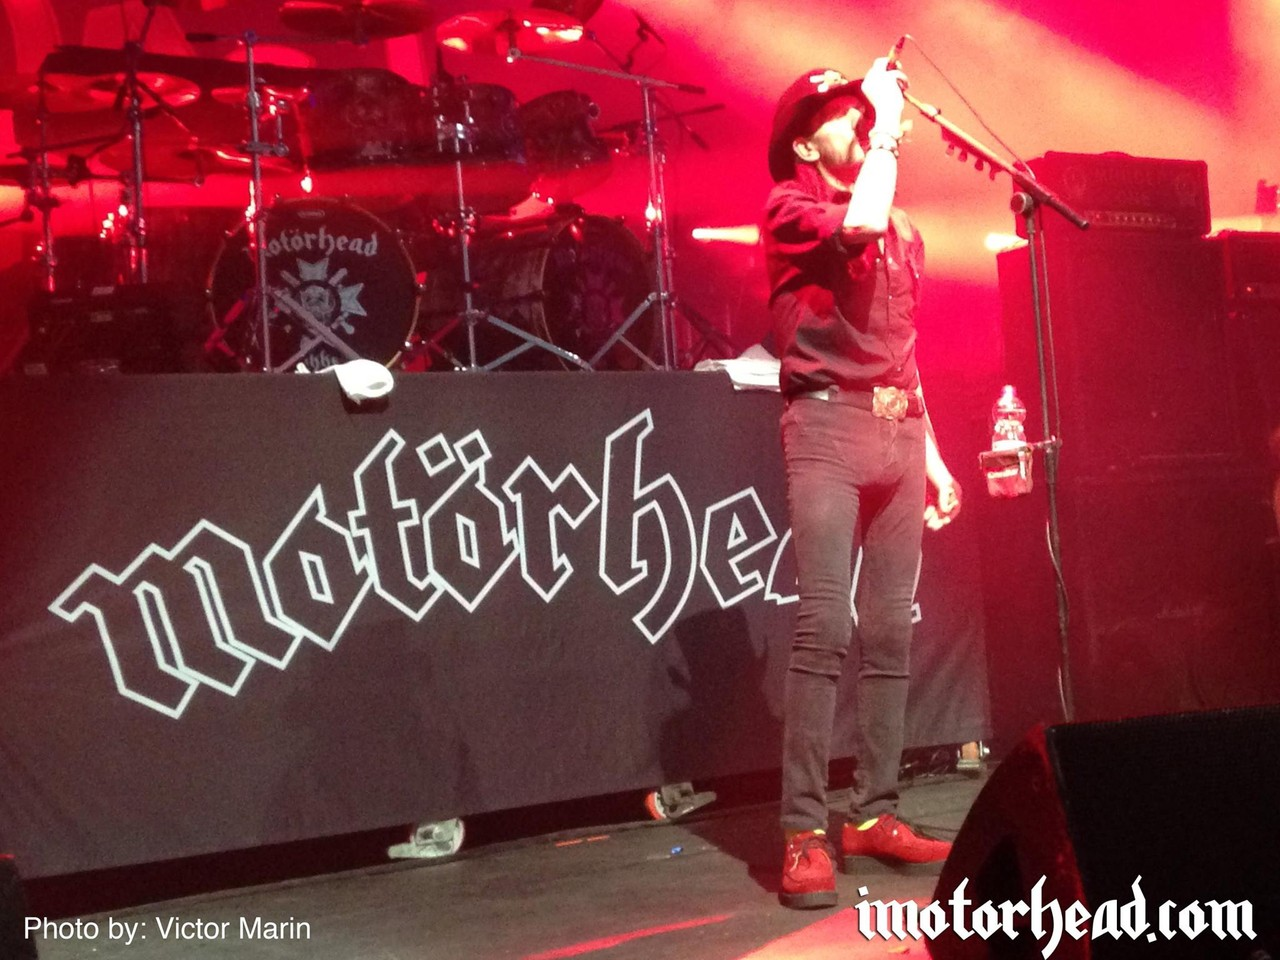 motorhead_palco.jpg